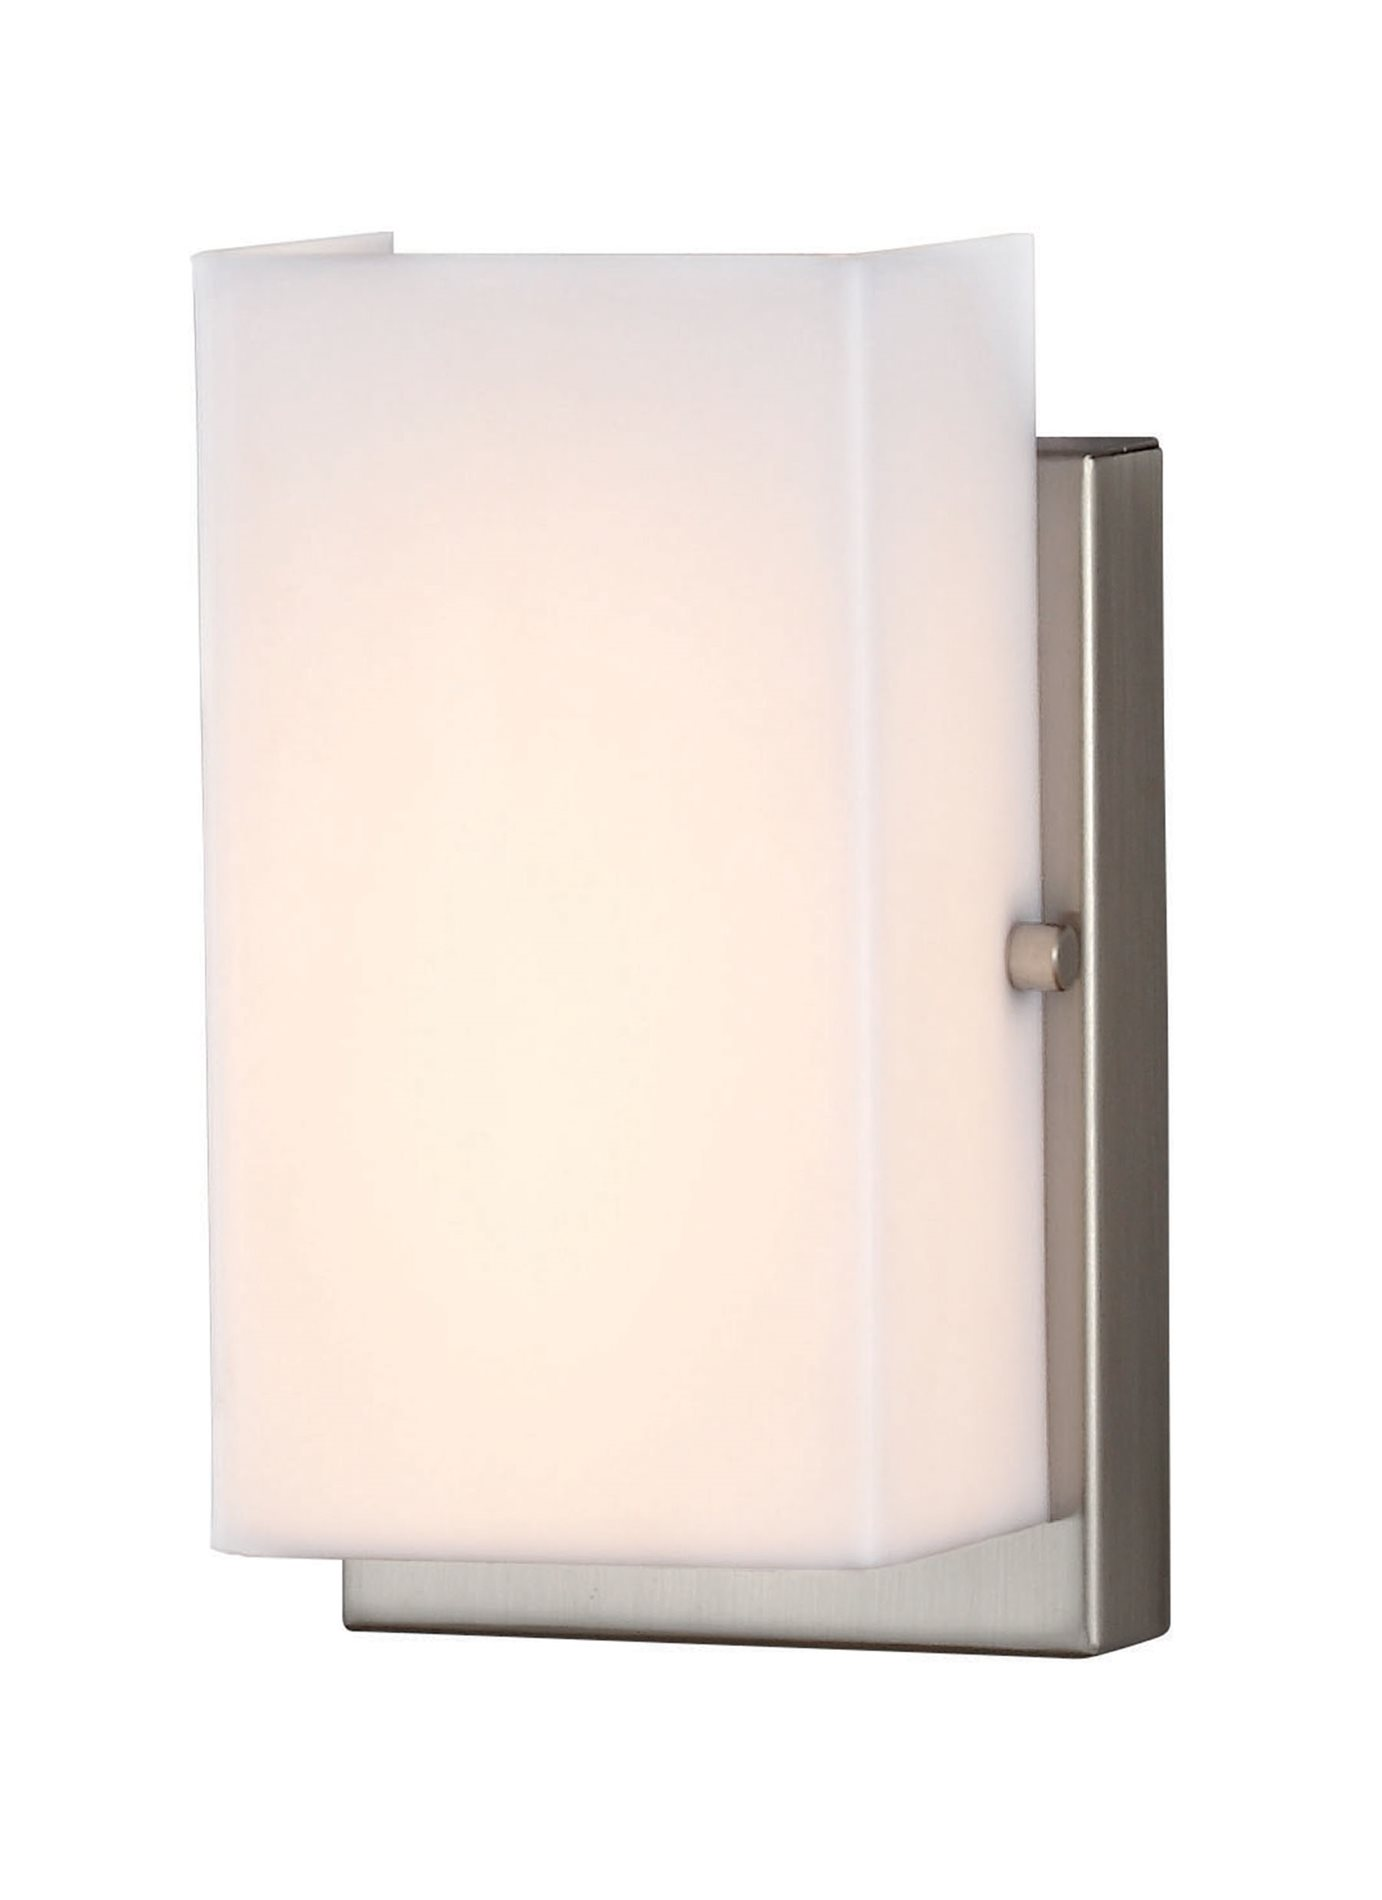 Sea Gull Lighting 4122991S 962 Vandeventer LED Modern Contemporary Wall Sco